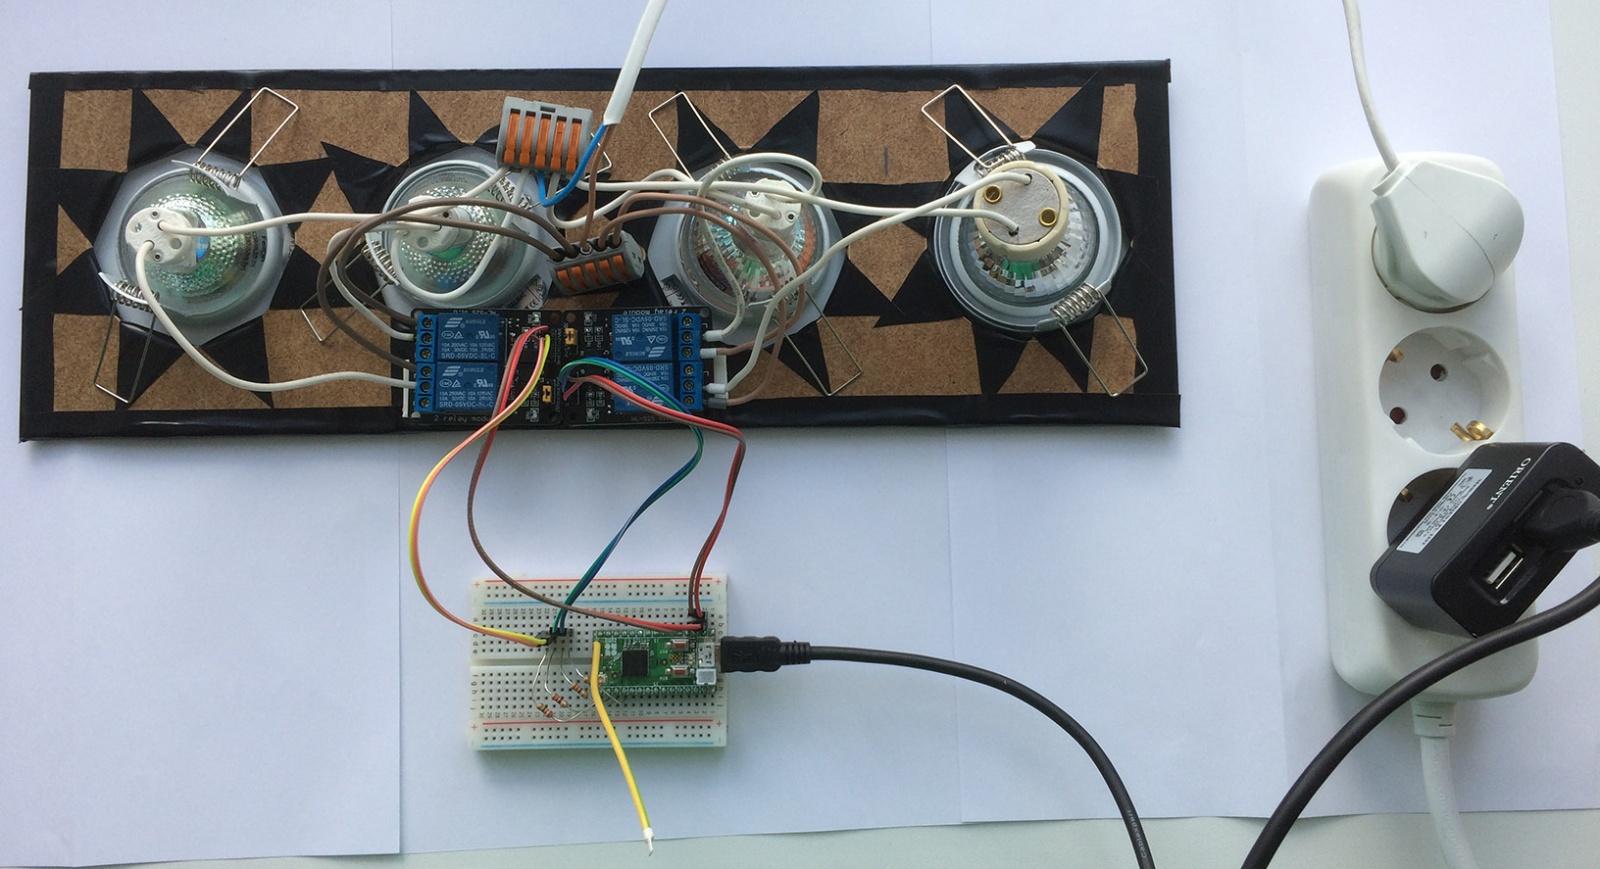 Z-Wave светофор на базе платы Z-UNO - 3